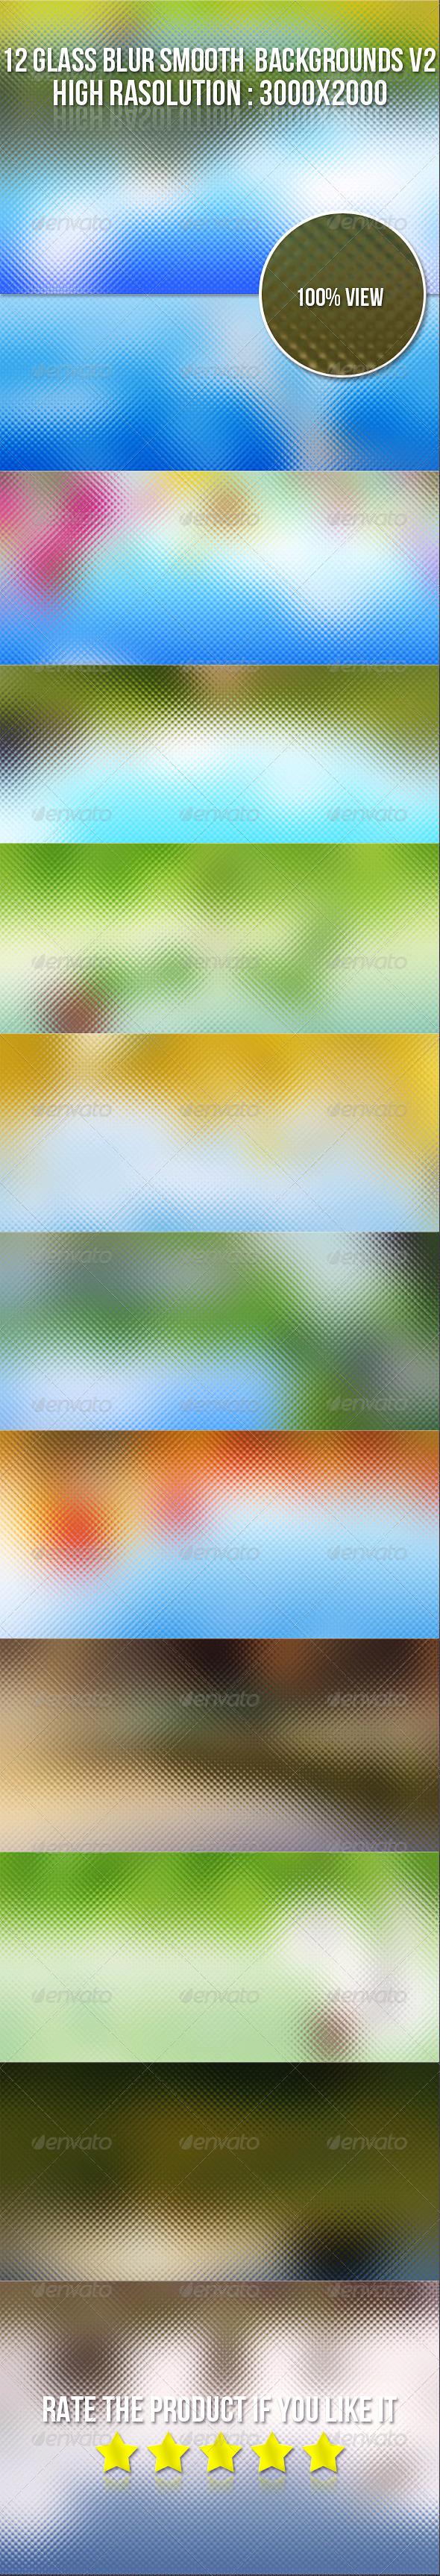 12 Glass Blur Backgrounds V2 - Backgrounds Graphics